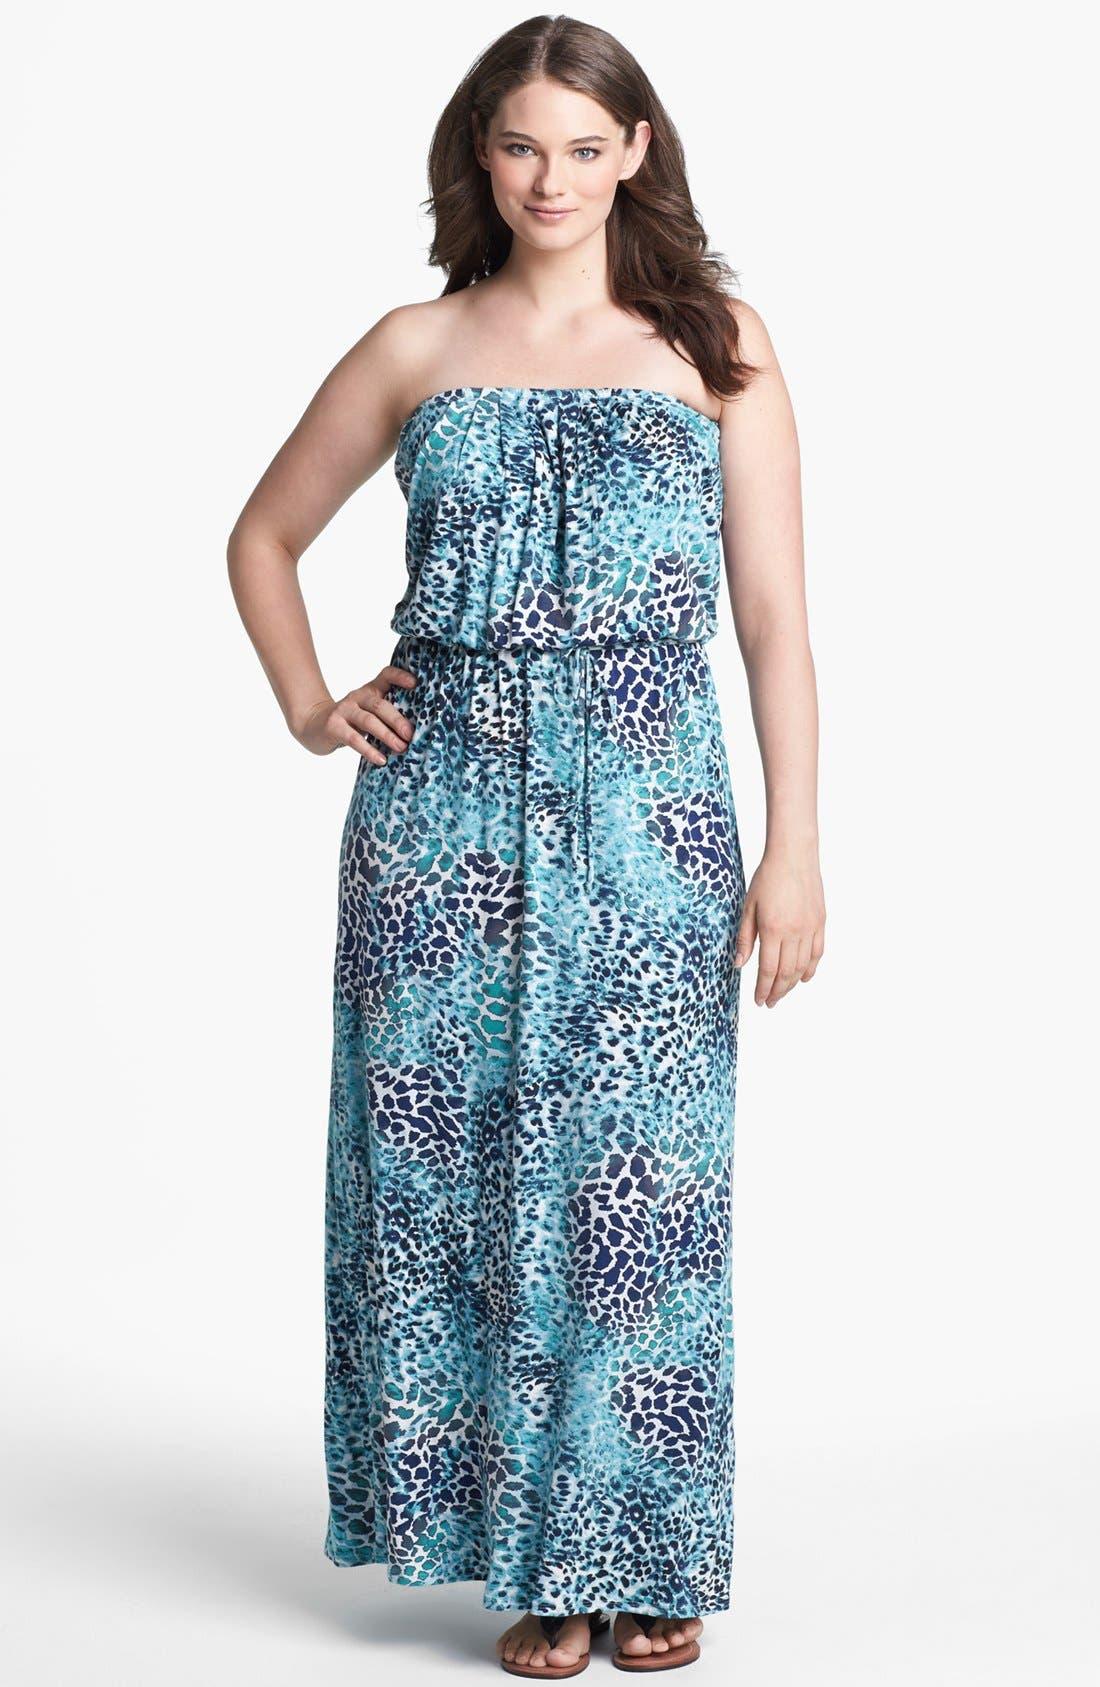 Alternate Image 1 Selected - Loveappella Print Blouson Maxi Dress (Plus Size)